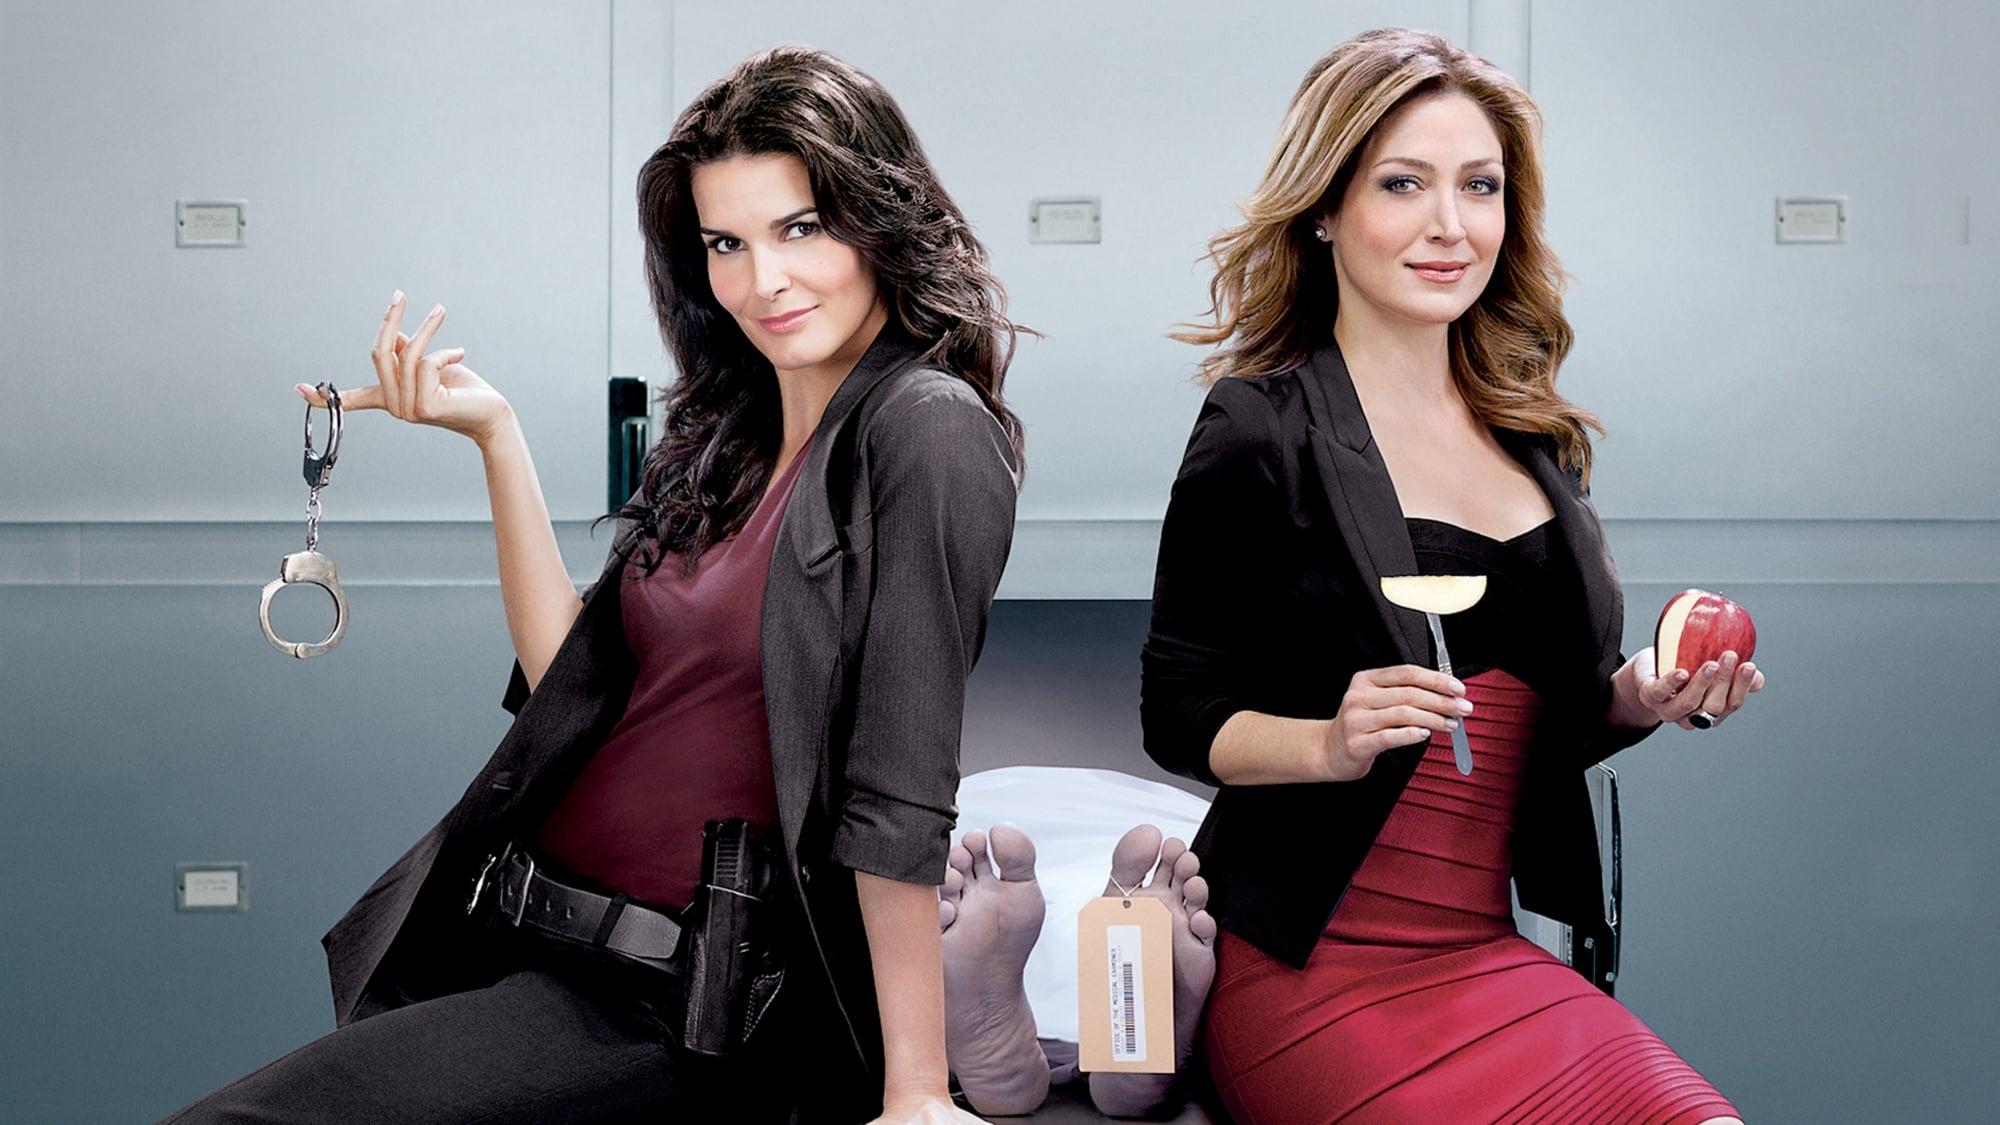 Rizzoli & Isles gets a sixth season